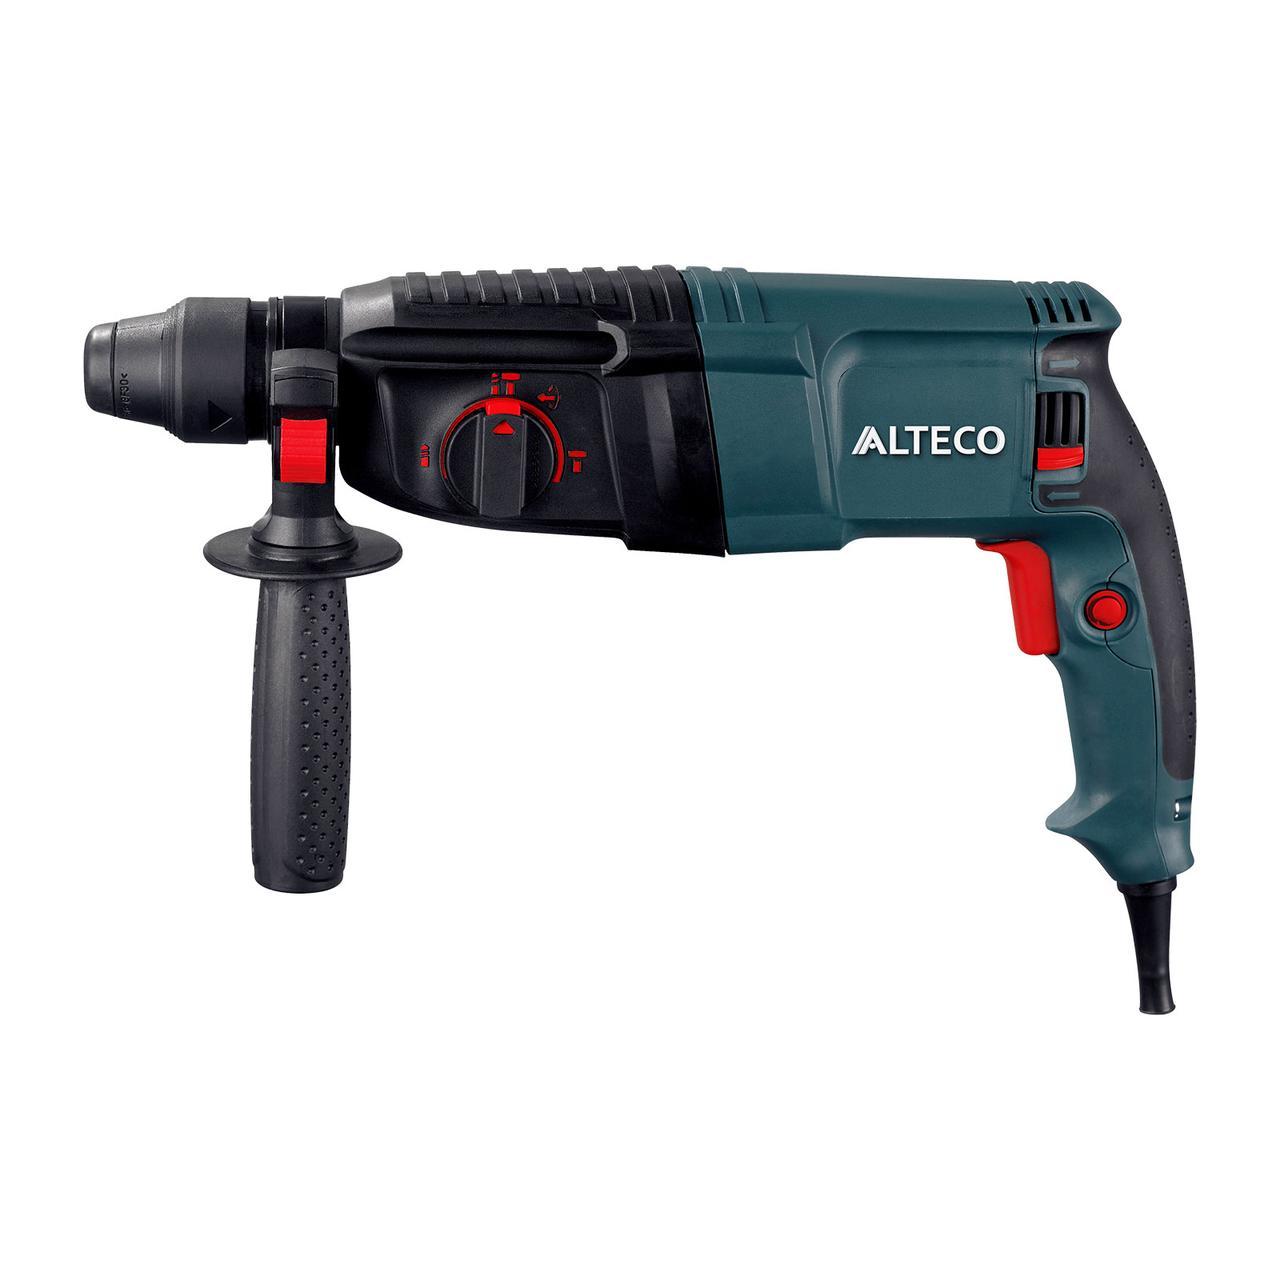 ALTECO RH 0215 Promo SDS-Plus / 26 мм Перфоратор